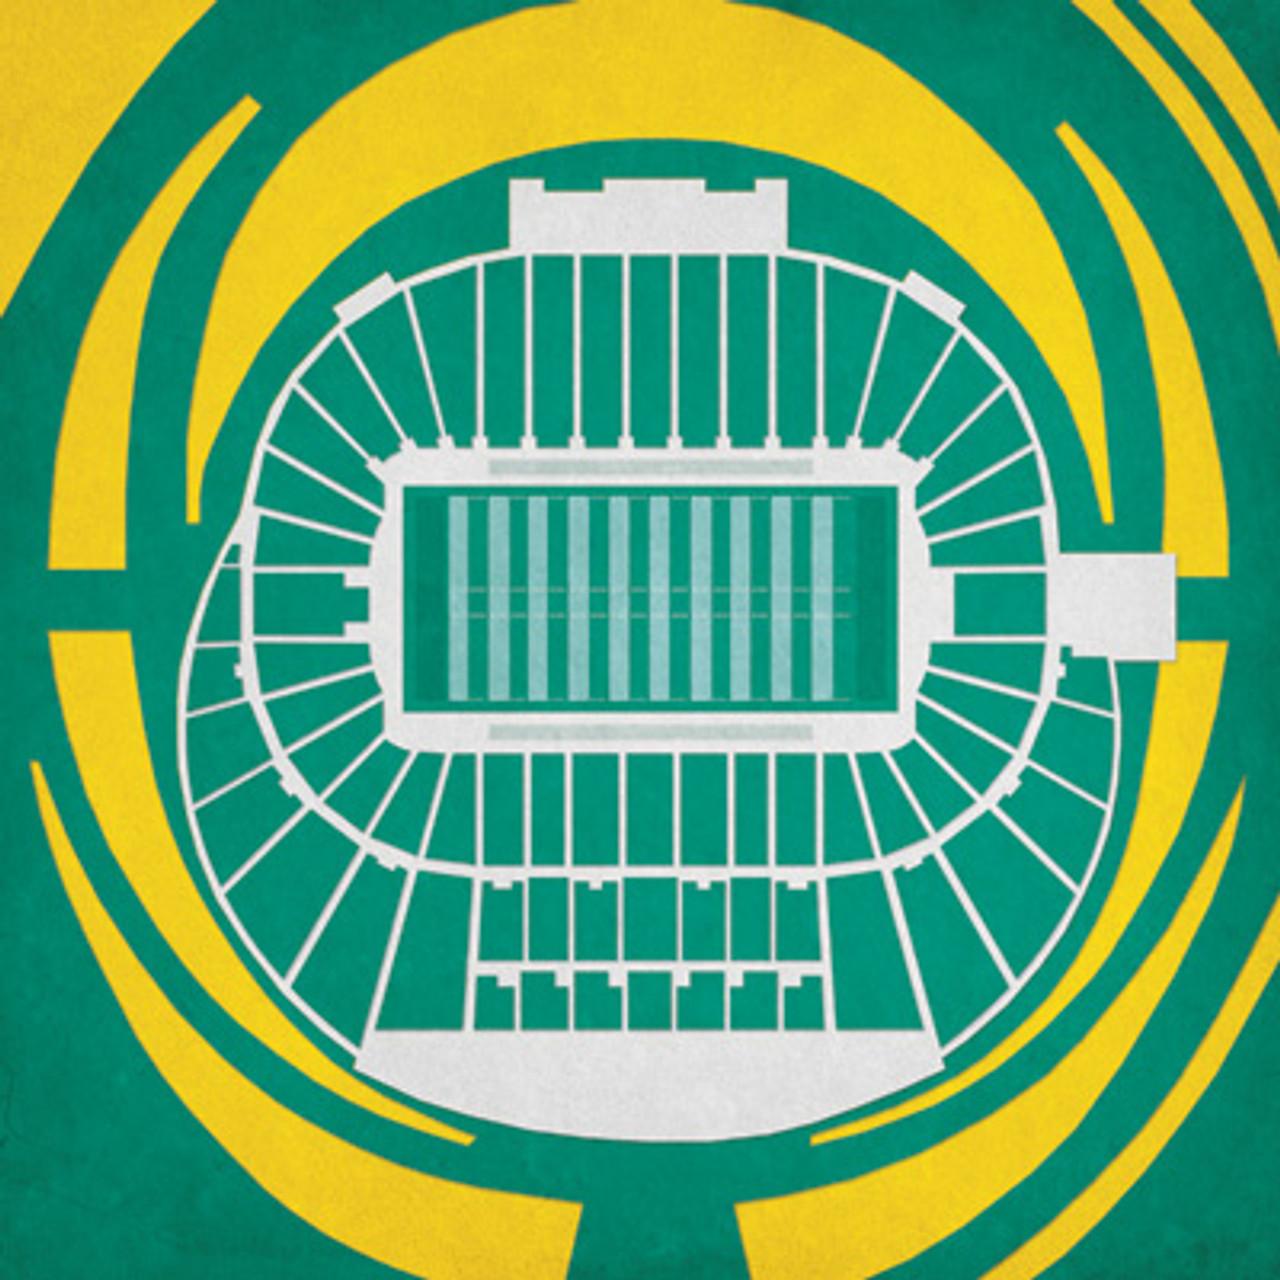 Oregon Ducks - Autzen Stadium City Print